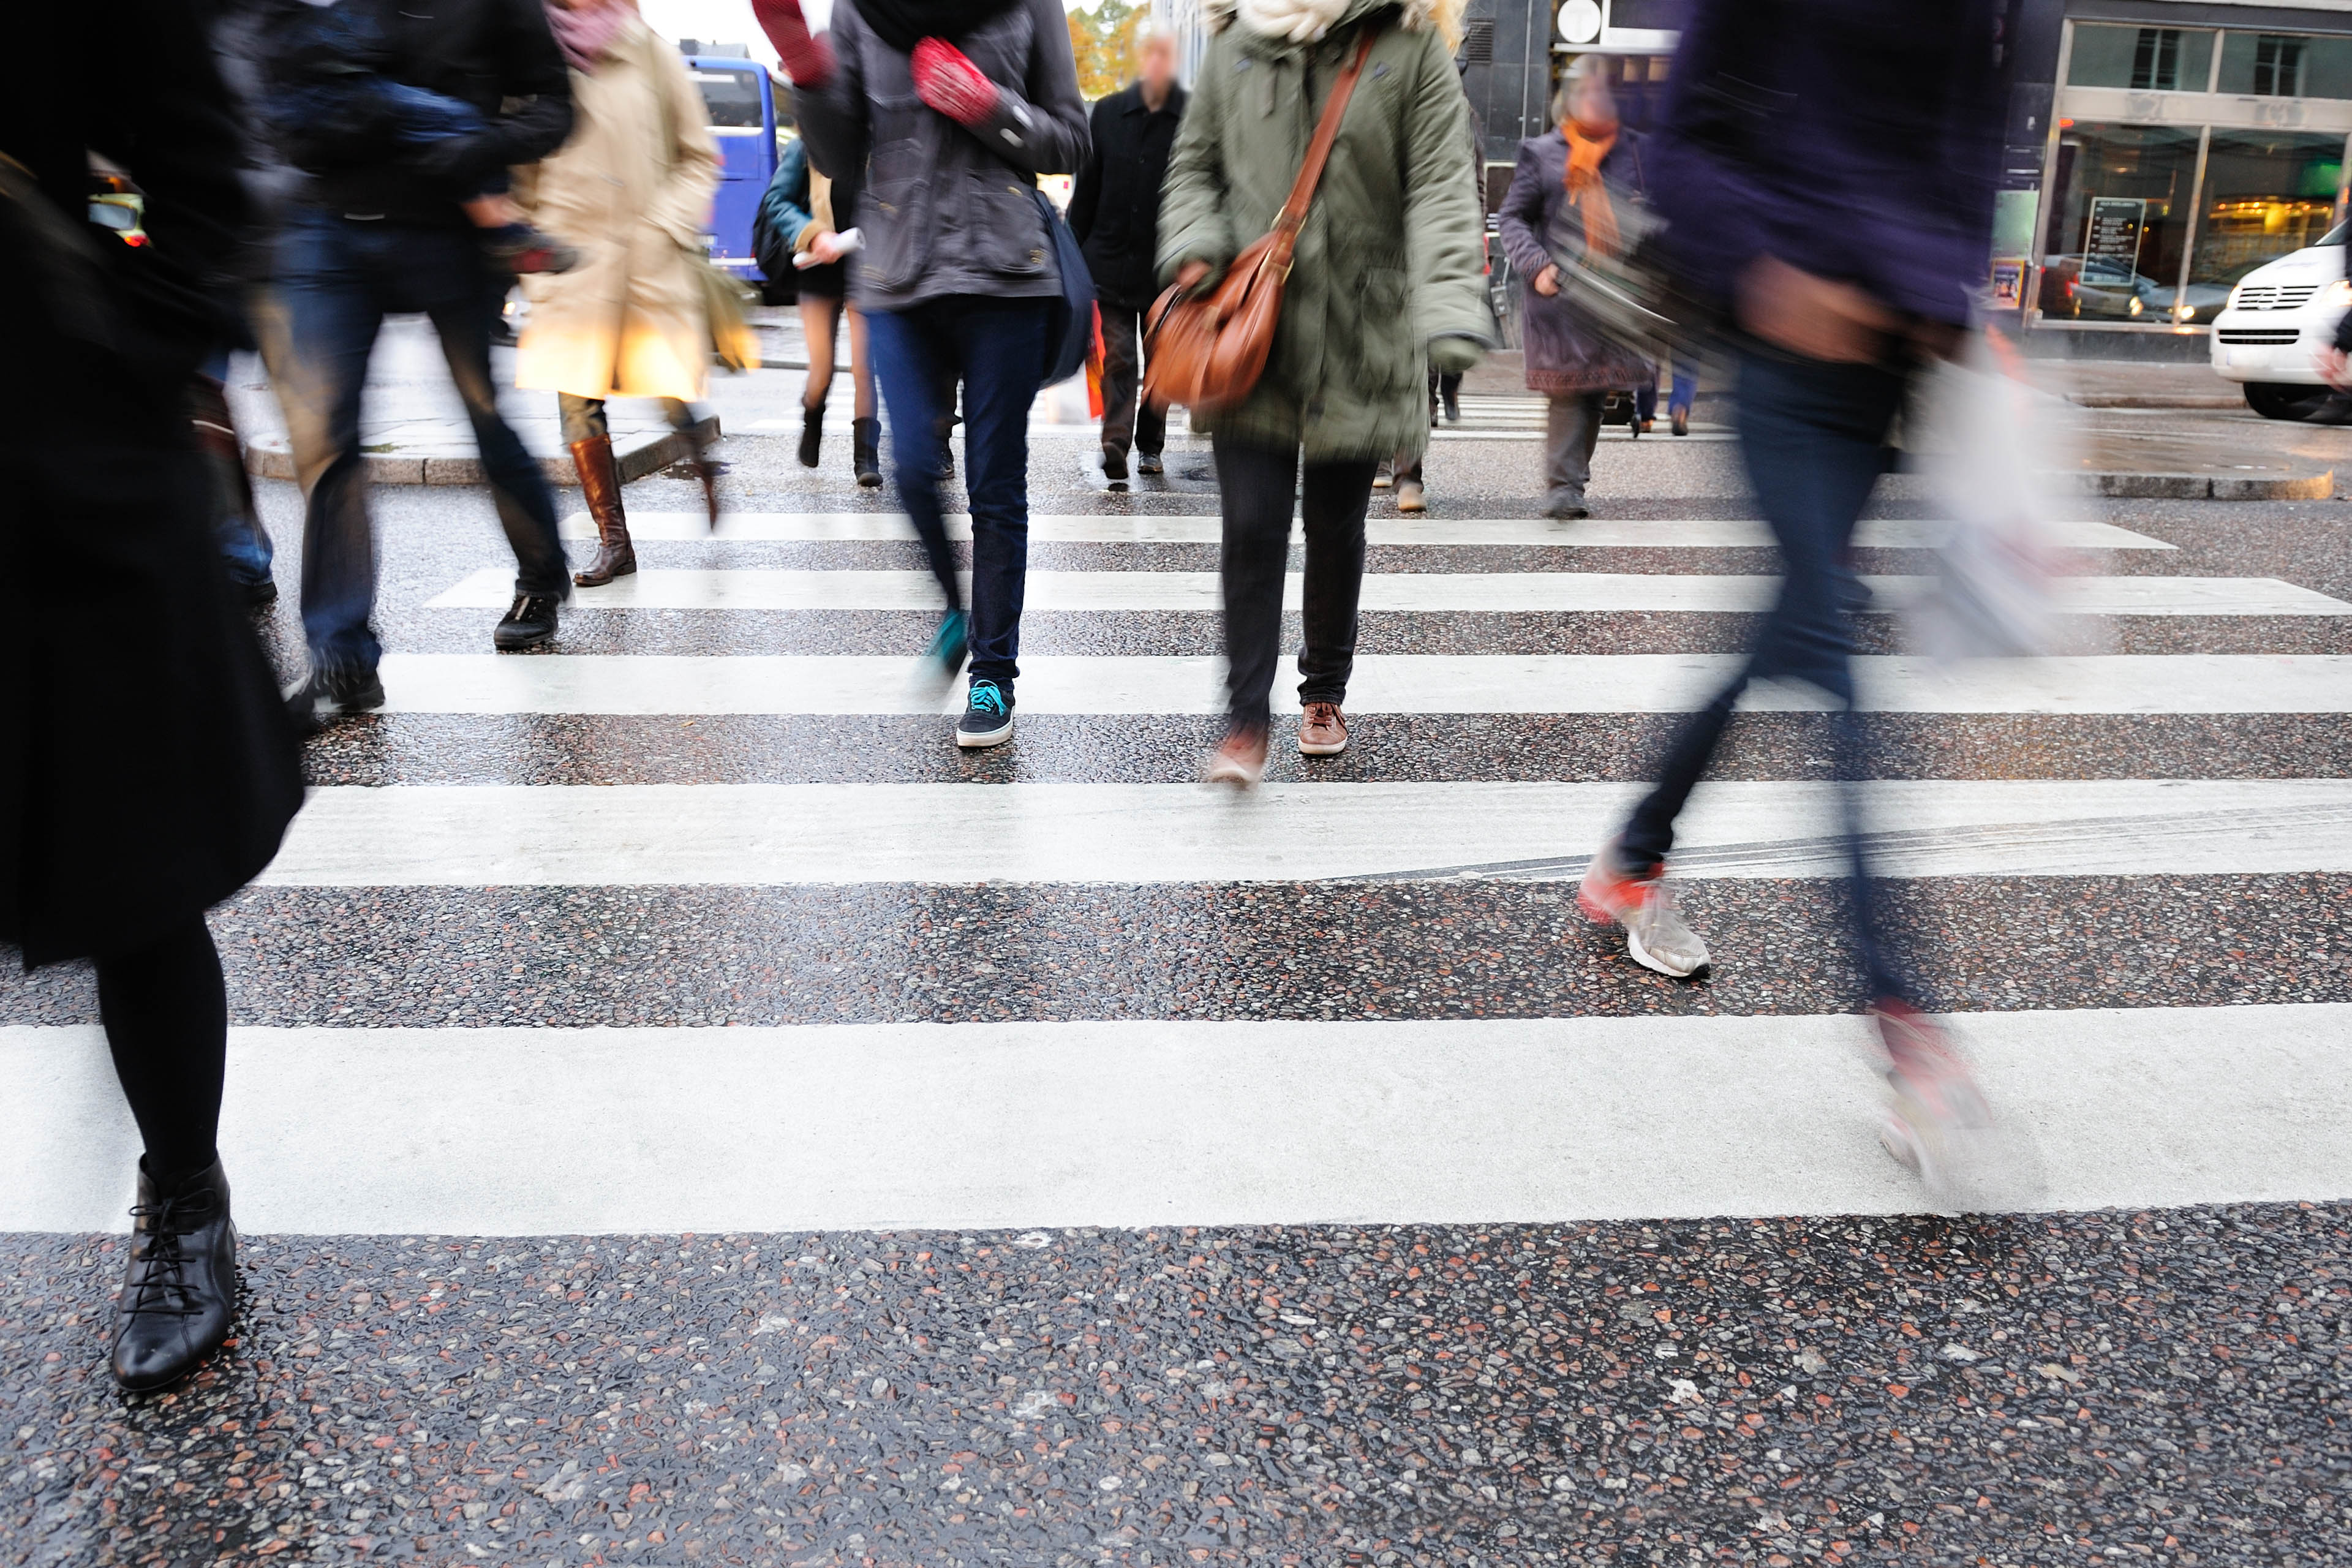 EY - Crowd on pedestrian crossing